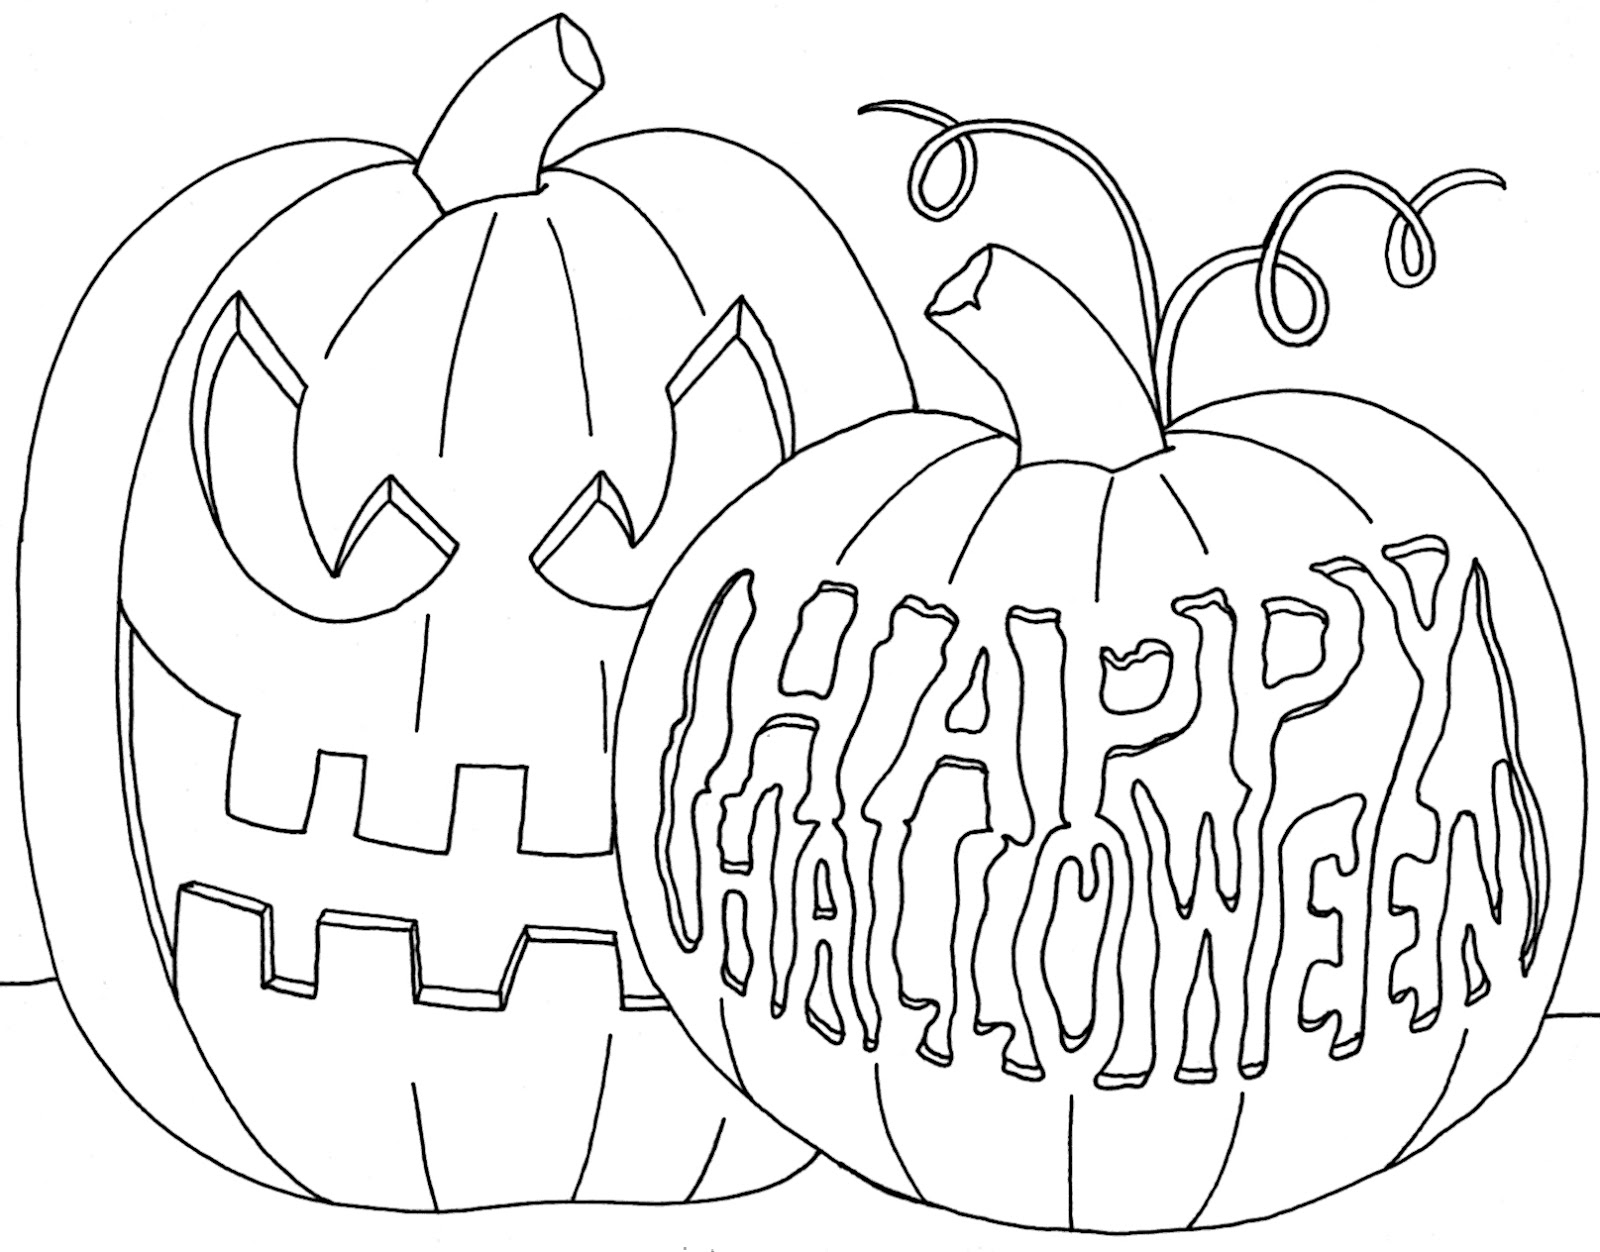 Happy Halloween Drawing At Getdrawings